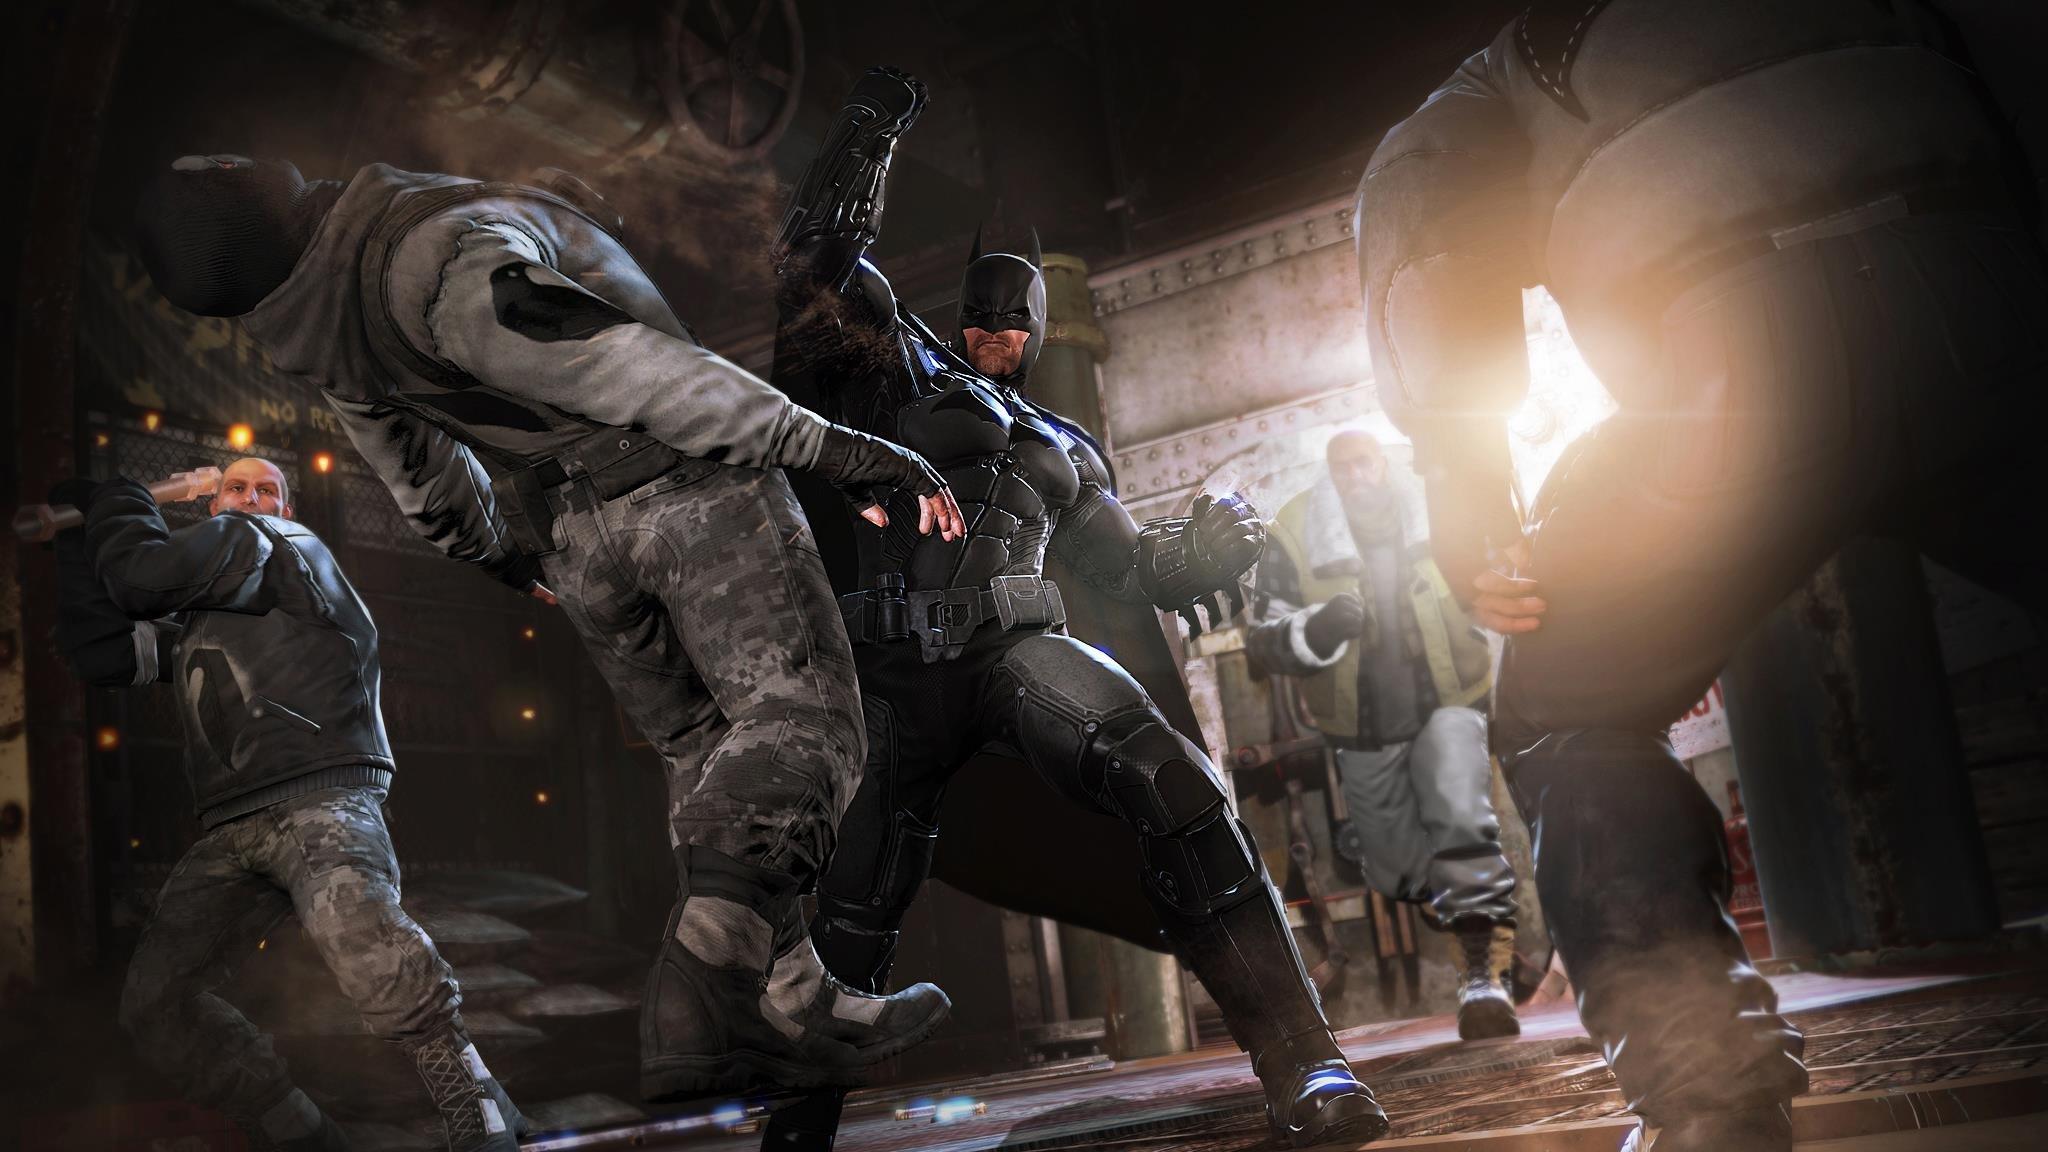 Video: Holy PR Hype! It's a 17 Minute Batman: Arkham ...